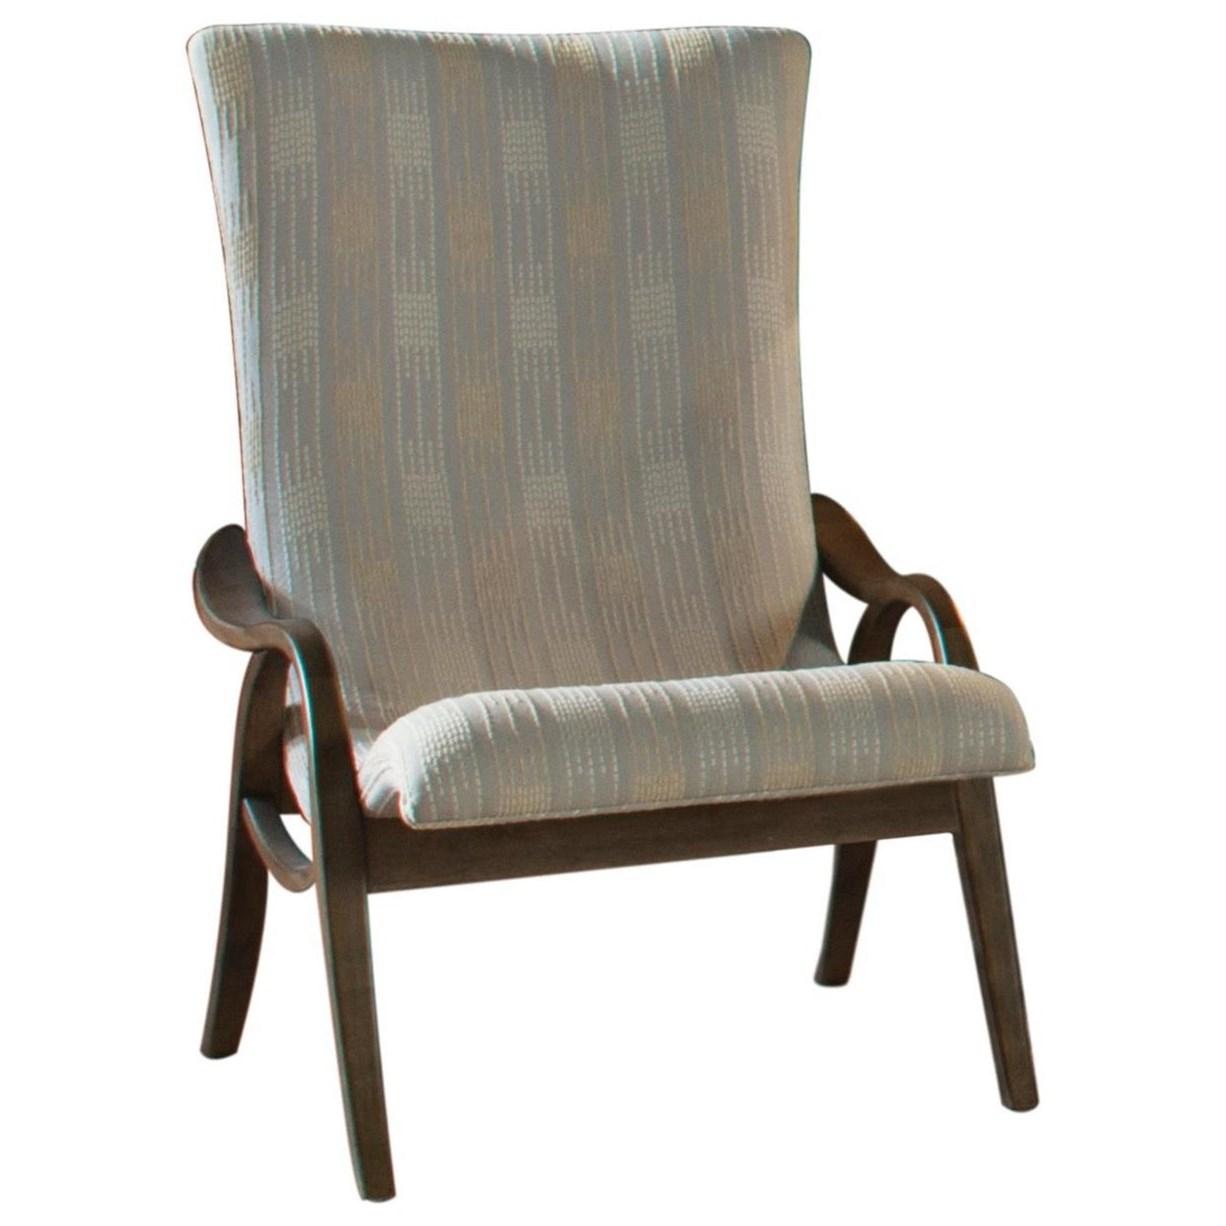 Charmant Belfort Signature Protege Miles Danish Sling Chair